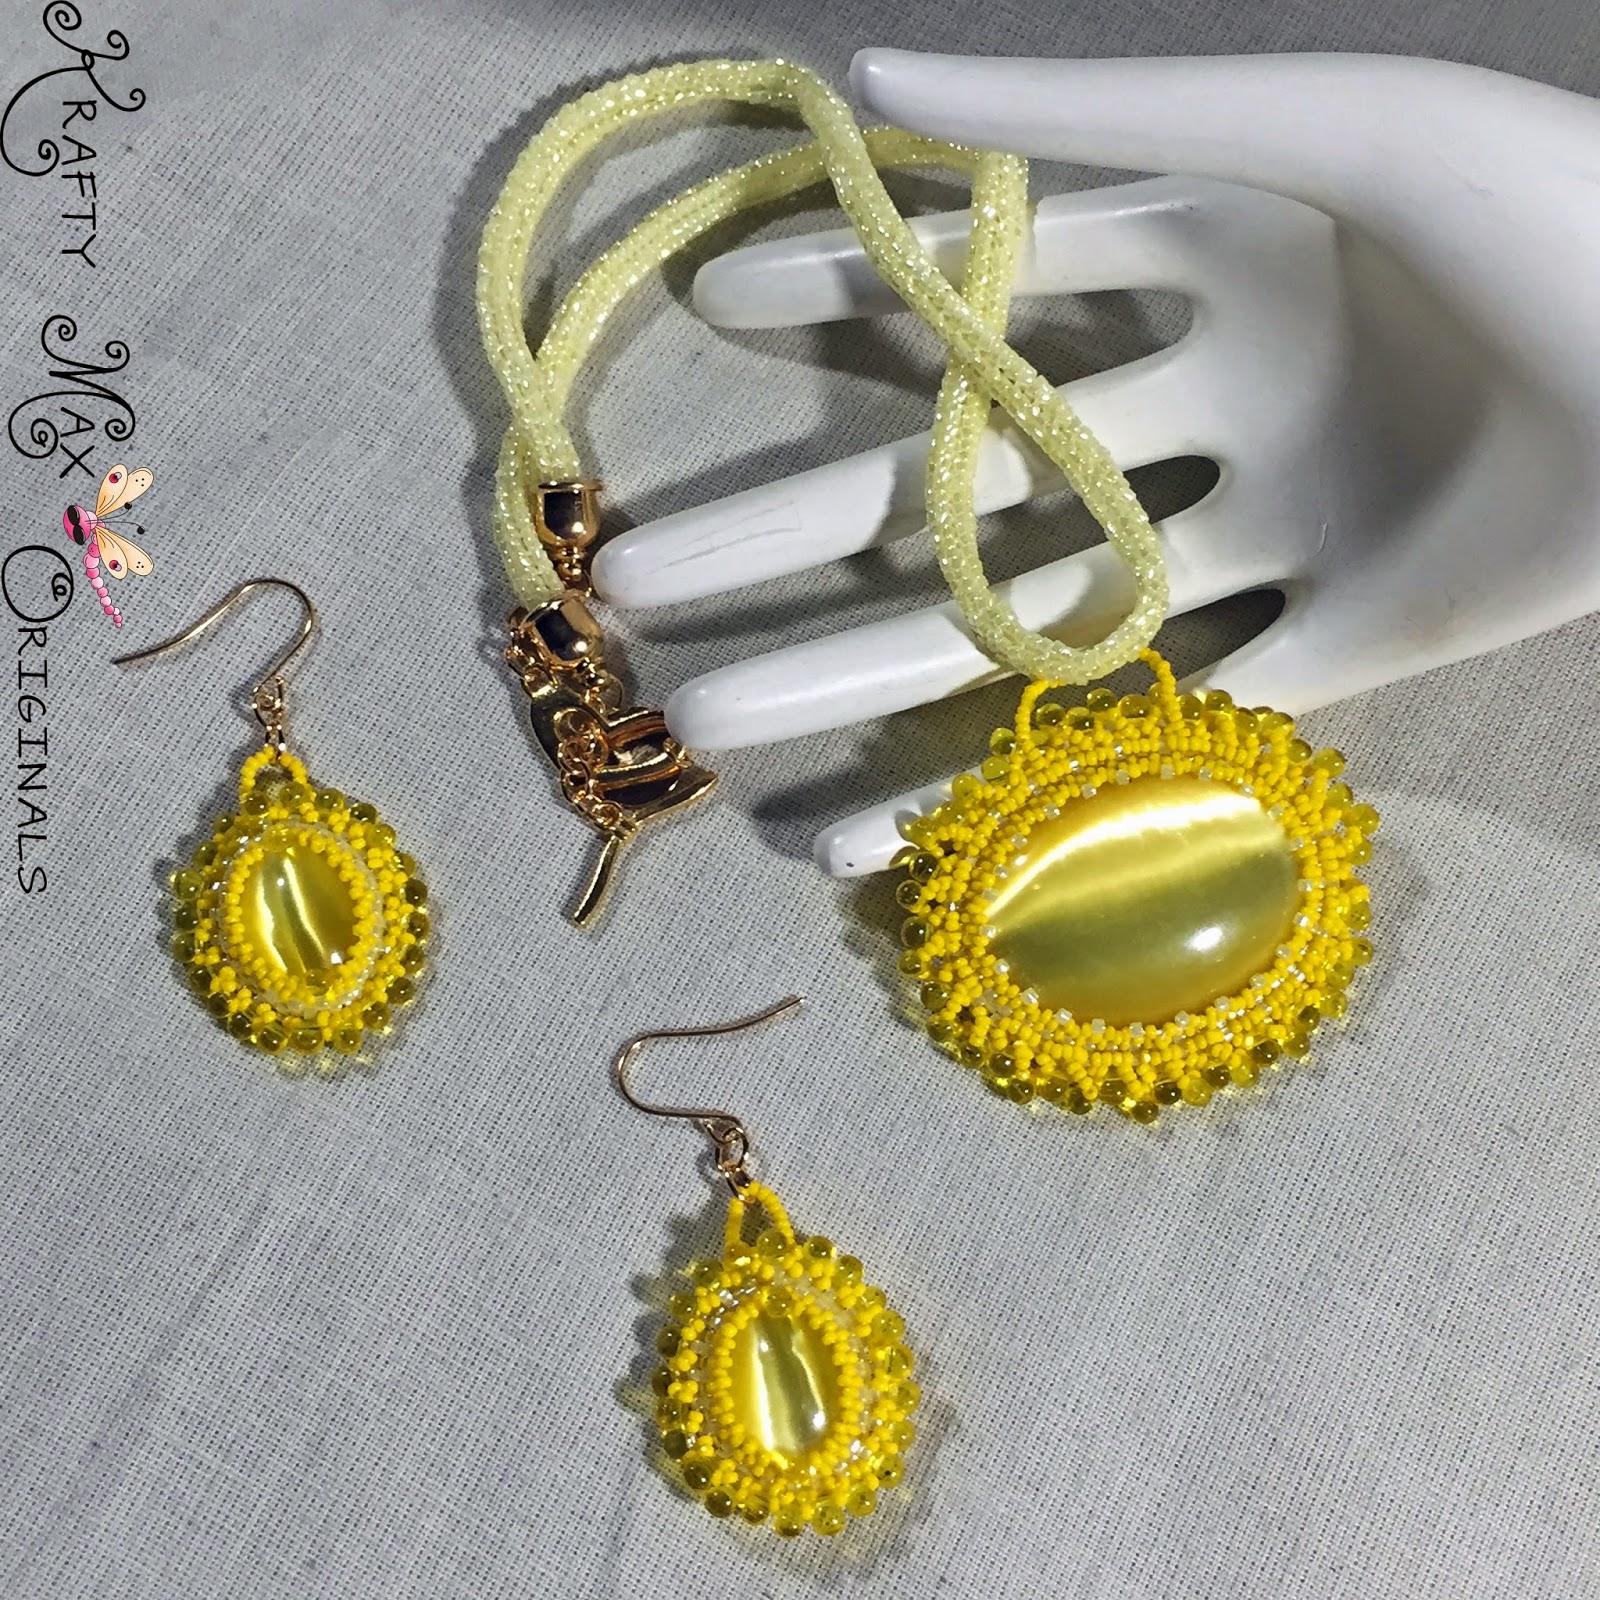 http://www.artfire.com/ext/shop/product_view/11250594